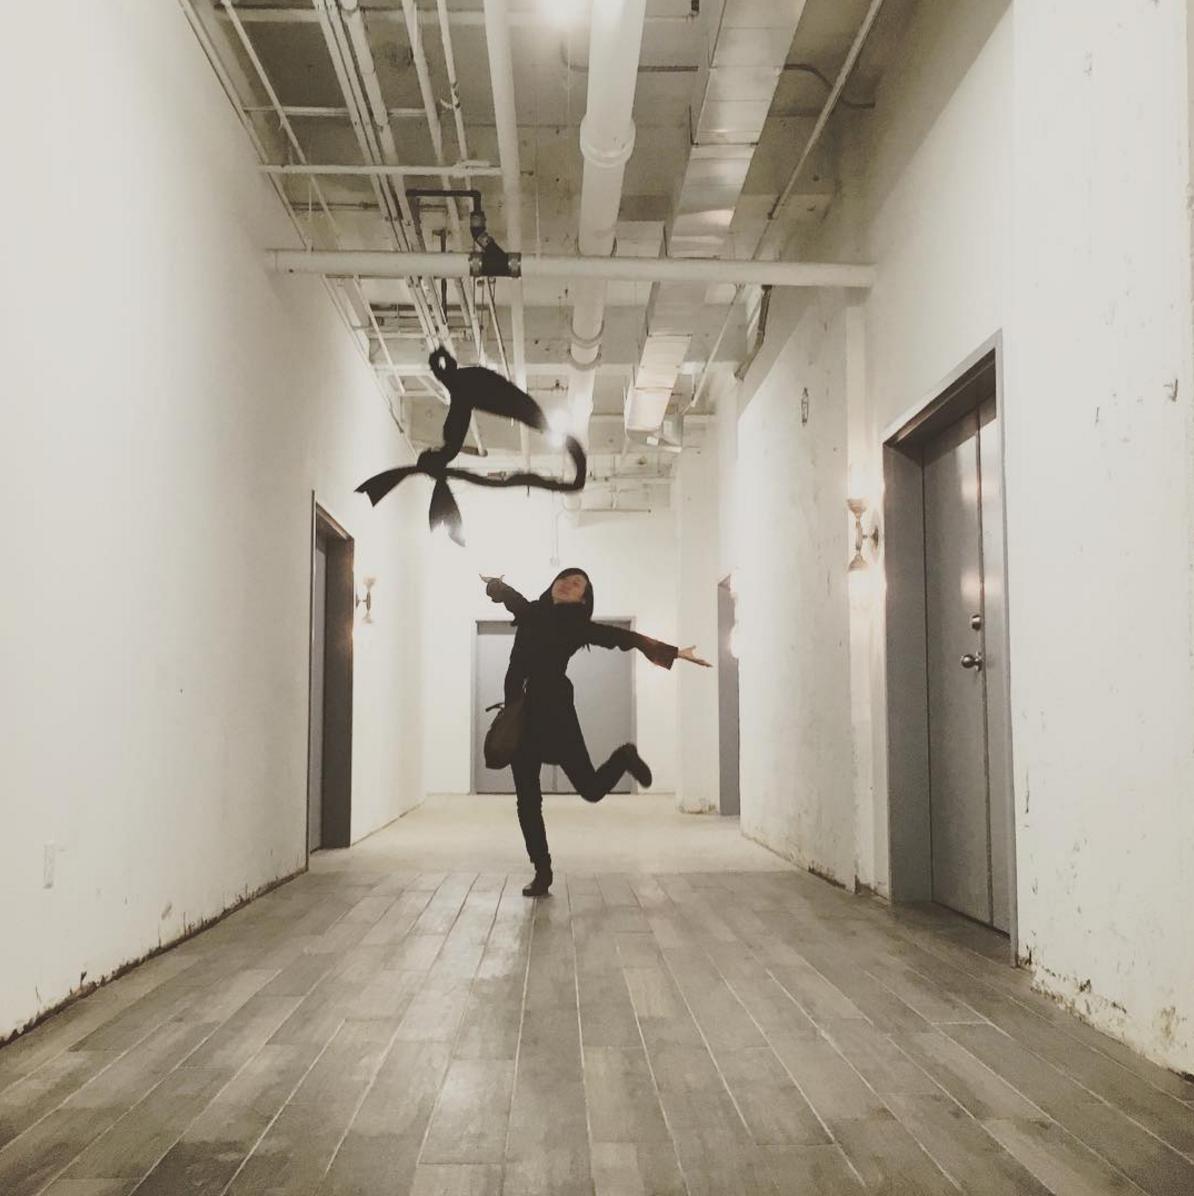 dancing-scarf-toronto.jpg